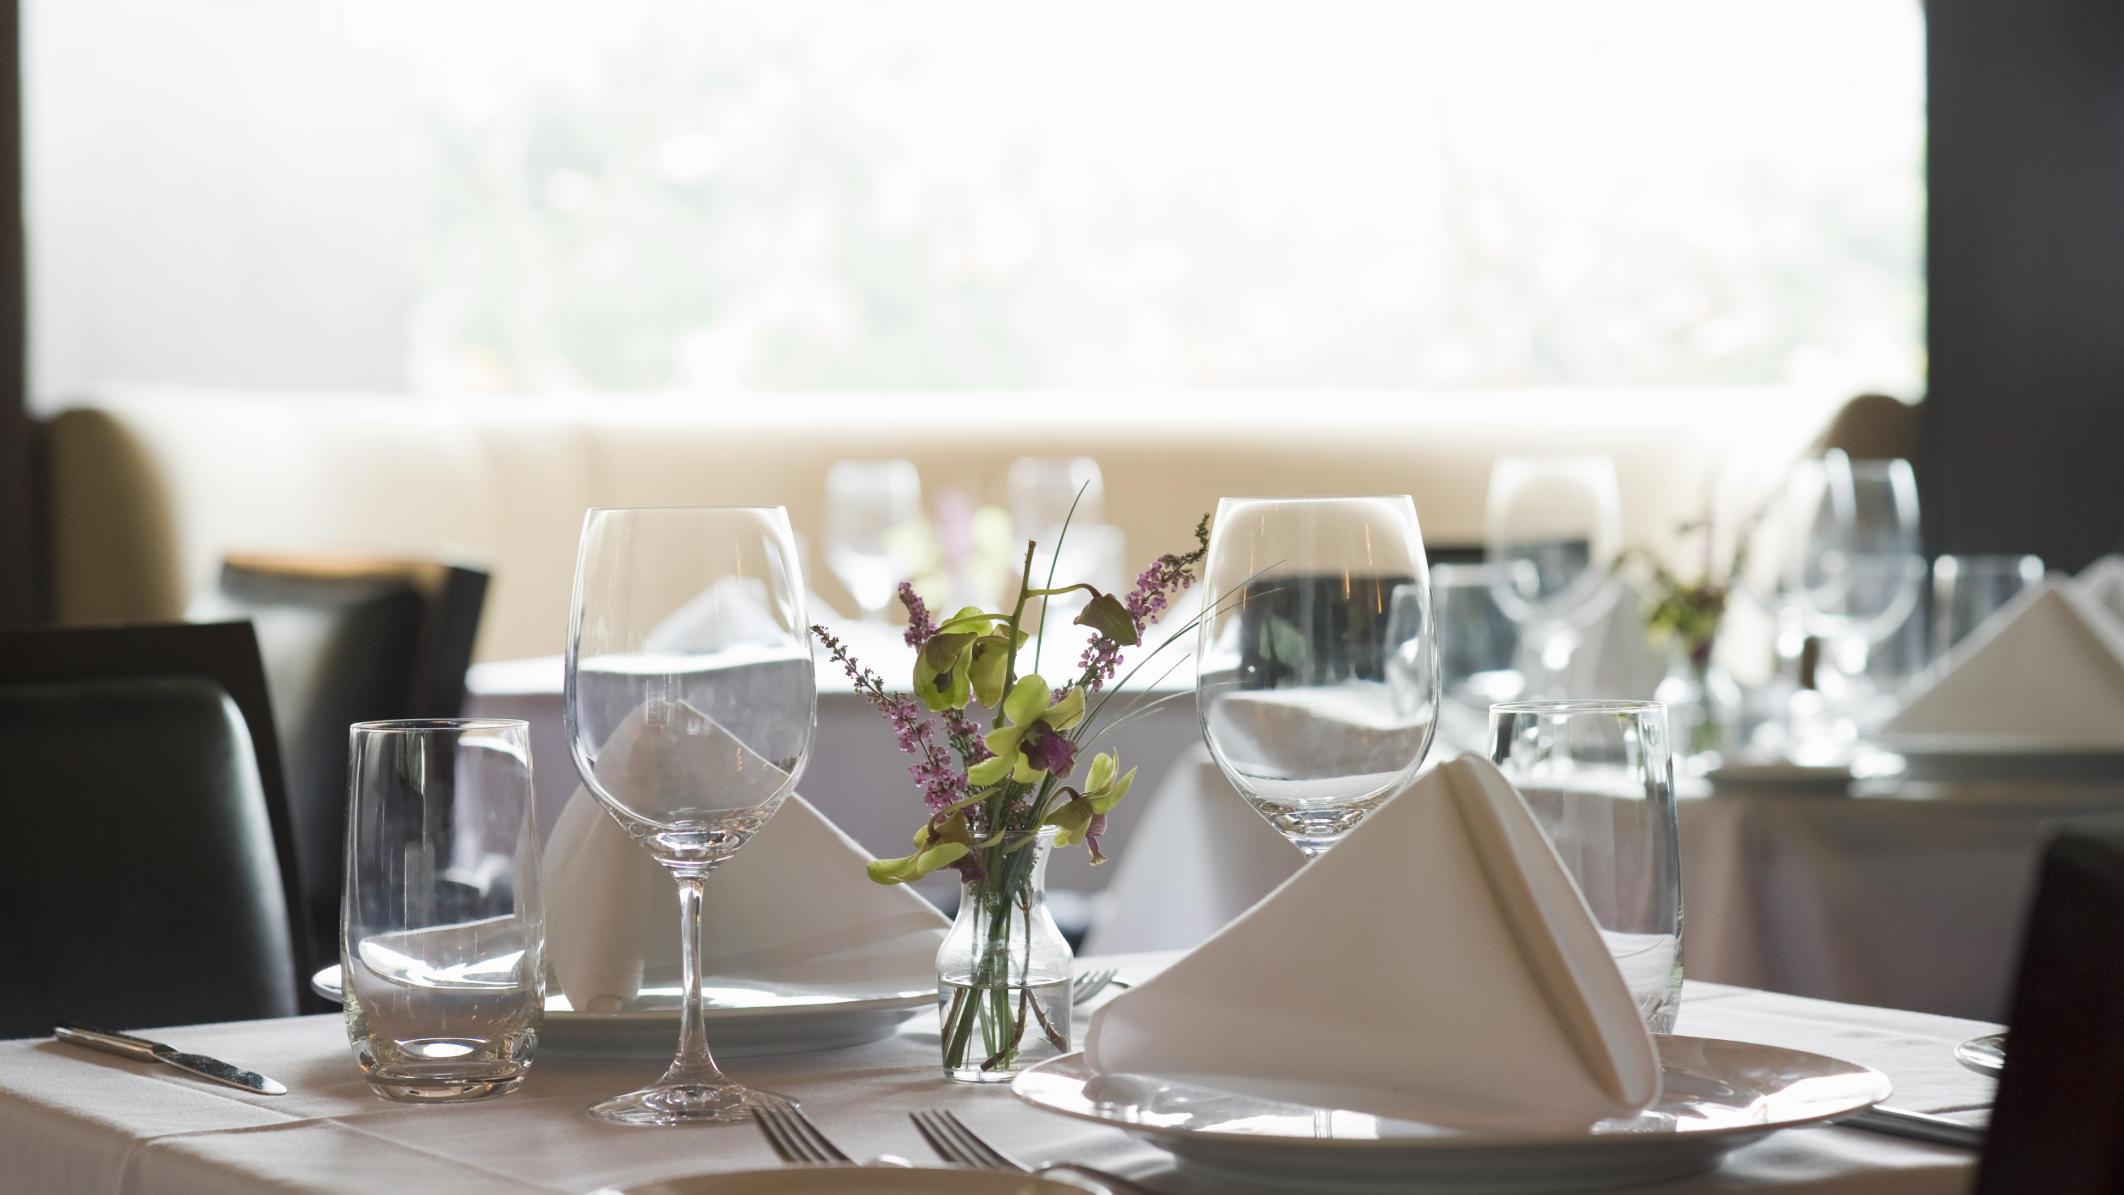 Restorant Bilek Istanbul Hotel